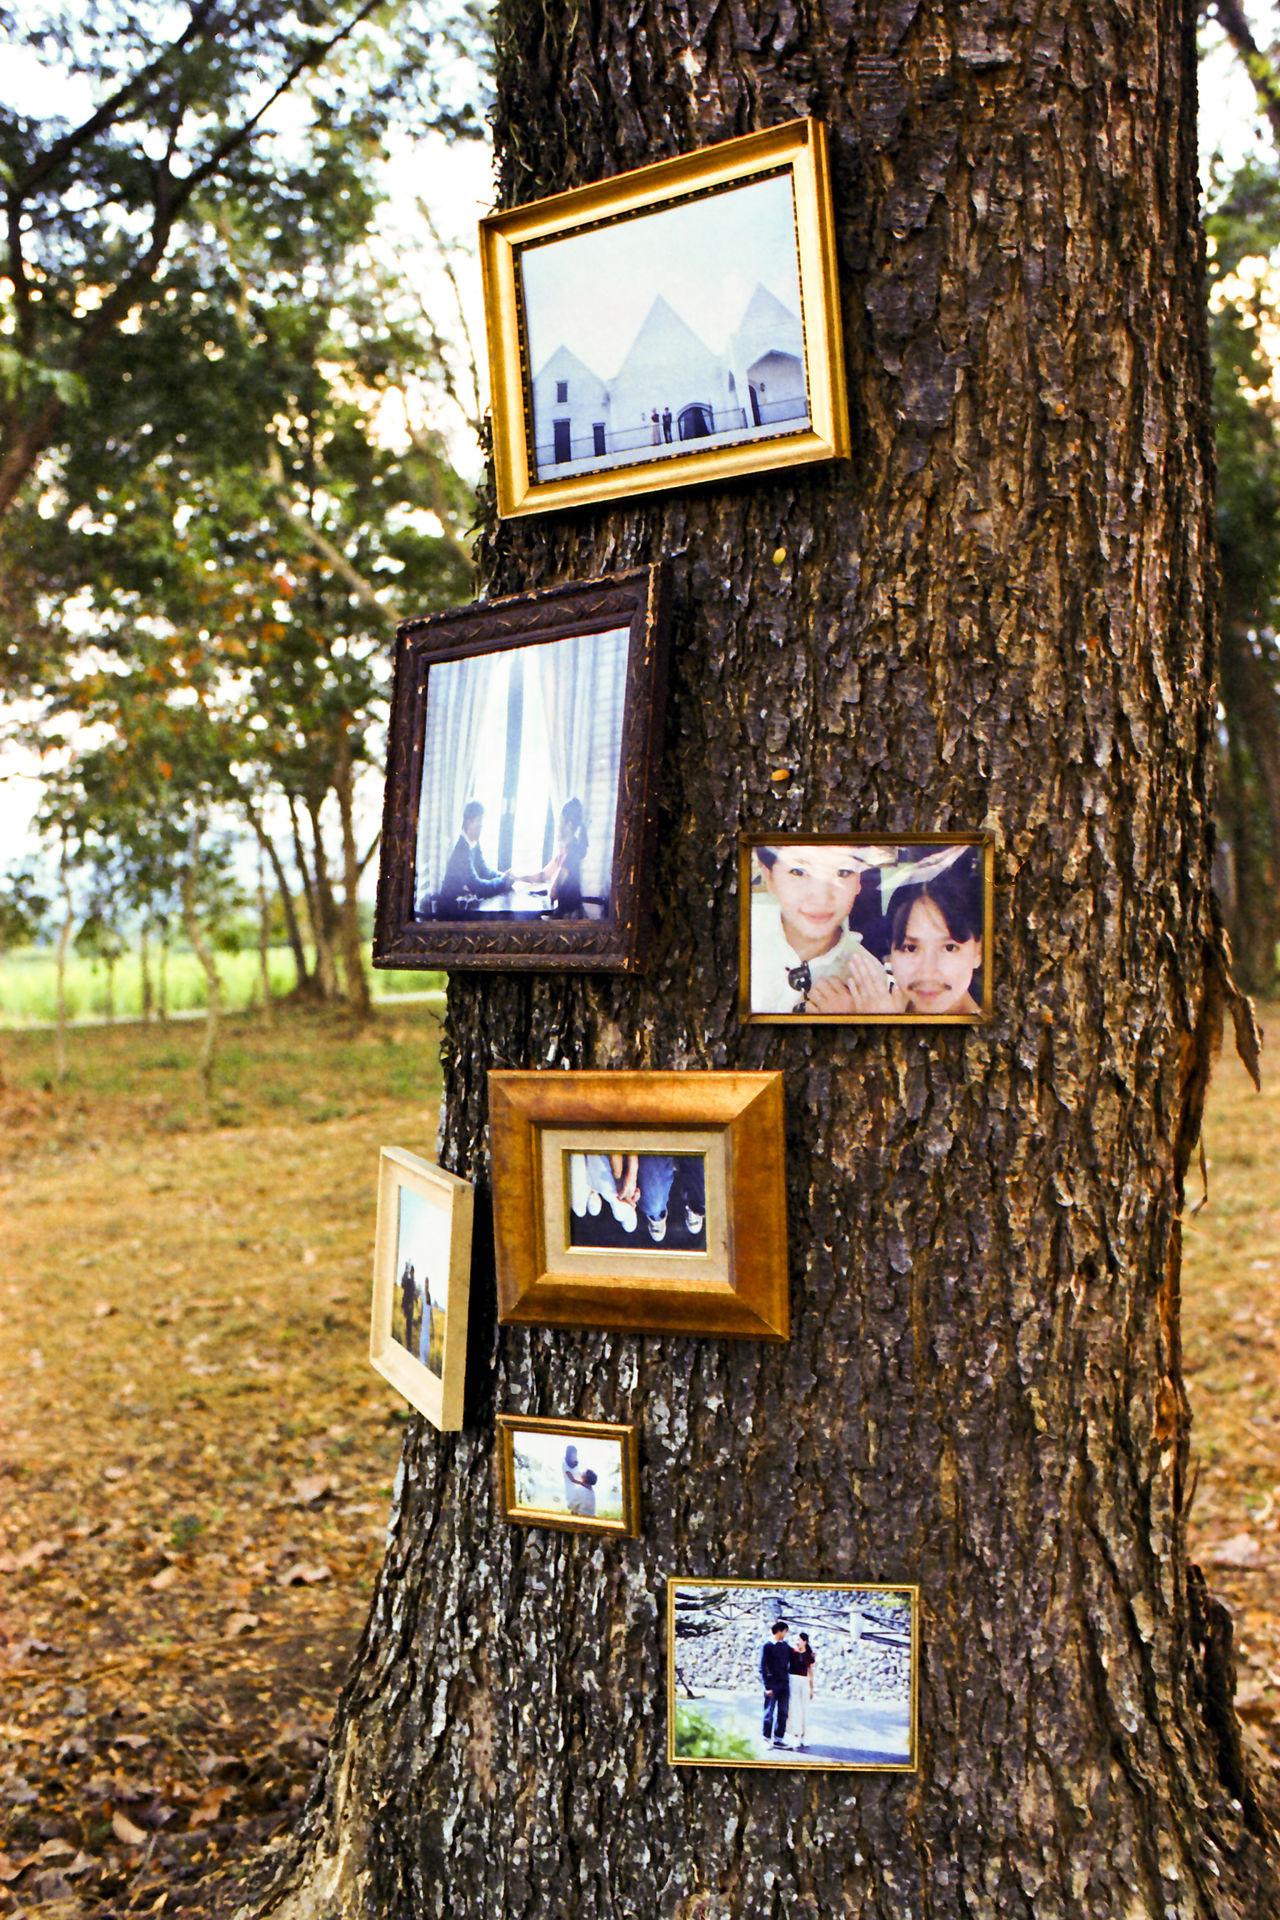 Kodakvision3 Married Landscape Film Filmlooks